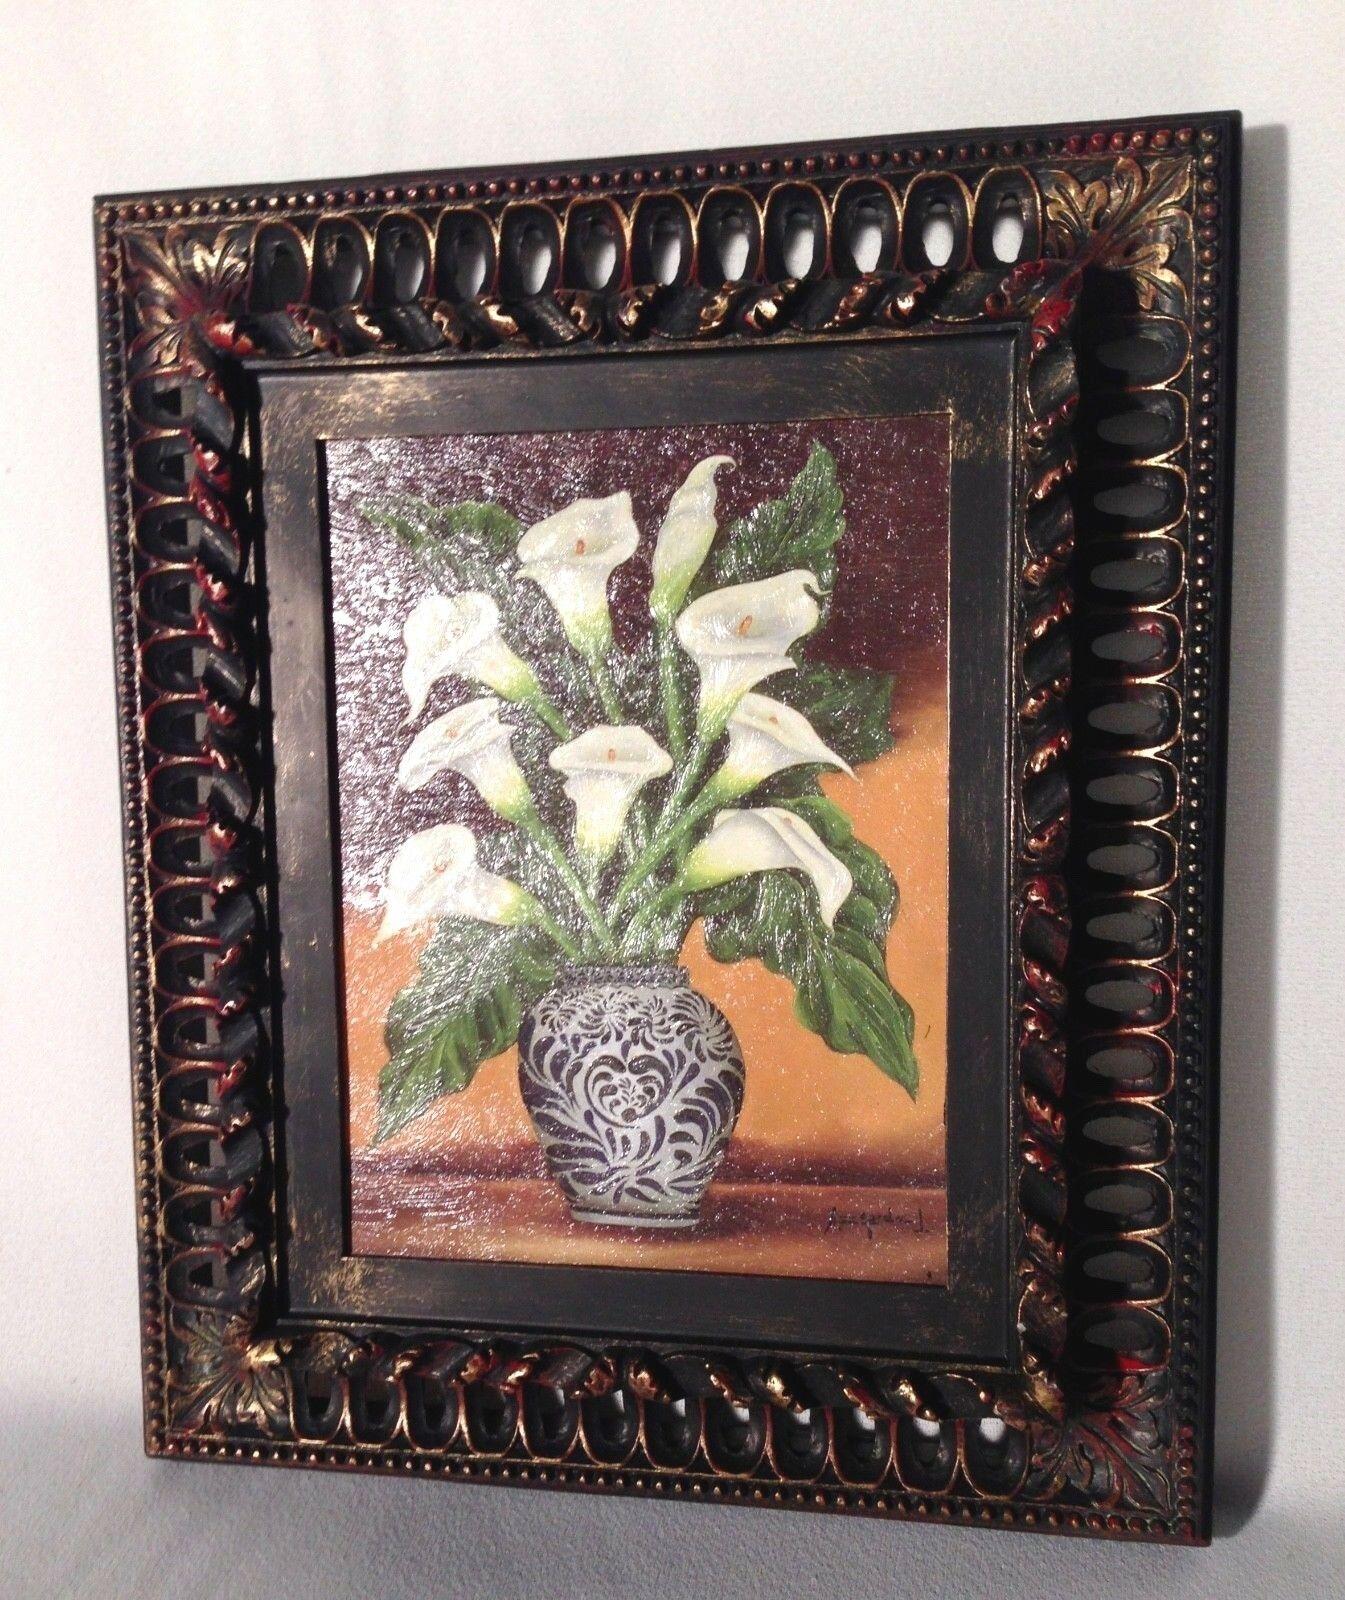 Blumen Bilderrahmen ölgemälde blumen calla bilderrahmen gold 30x36cm ölbild mit rahmen